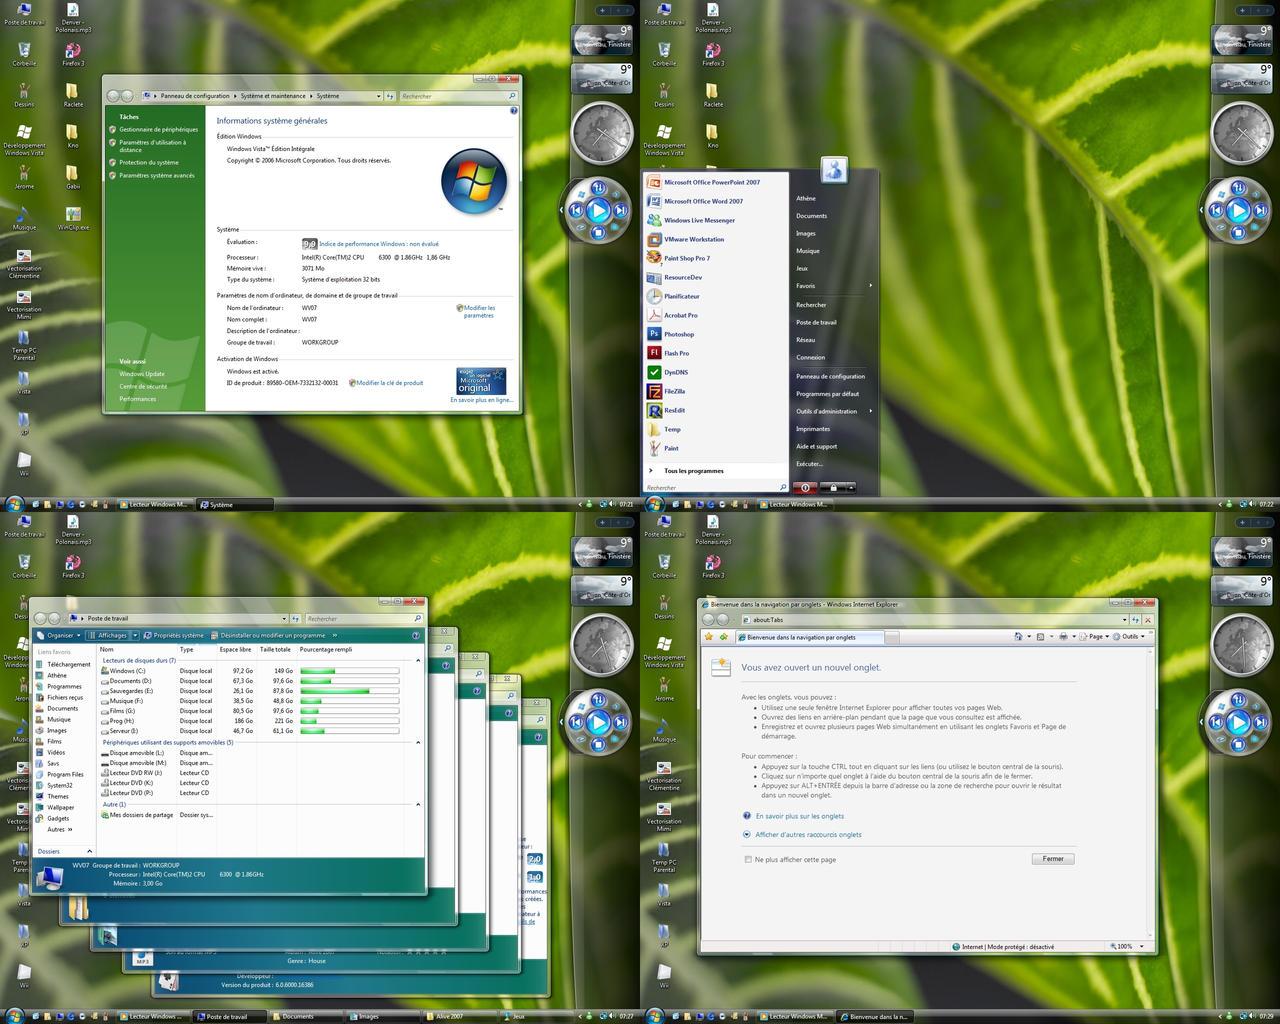 Windows vista 5259 preview by athenera on deviantart for Reduire fenetre windows